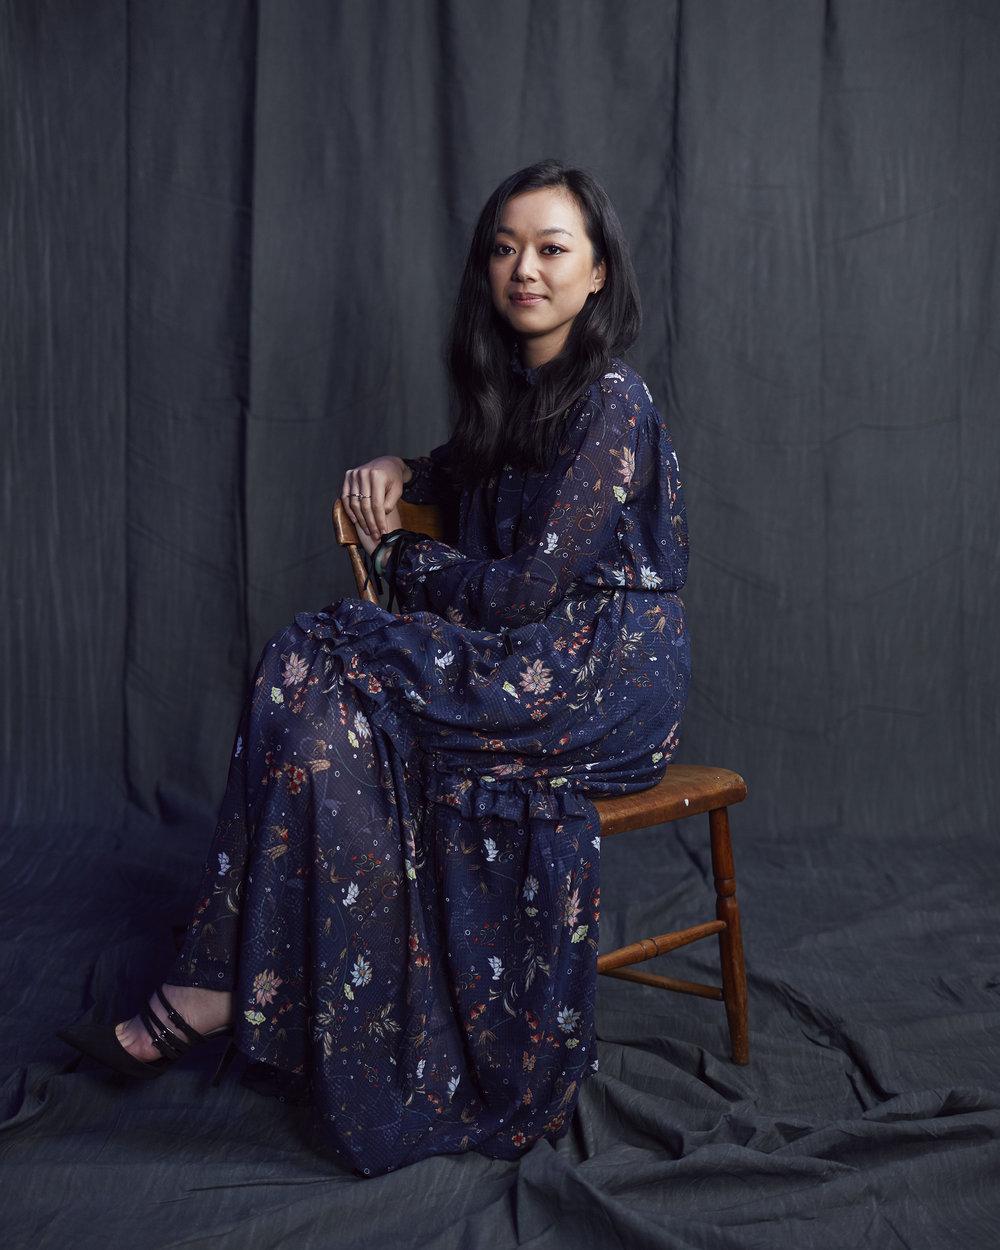 SF Film - 2017.04 - Helena Price Portrait Studio - 0105-sm.jpg